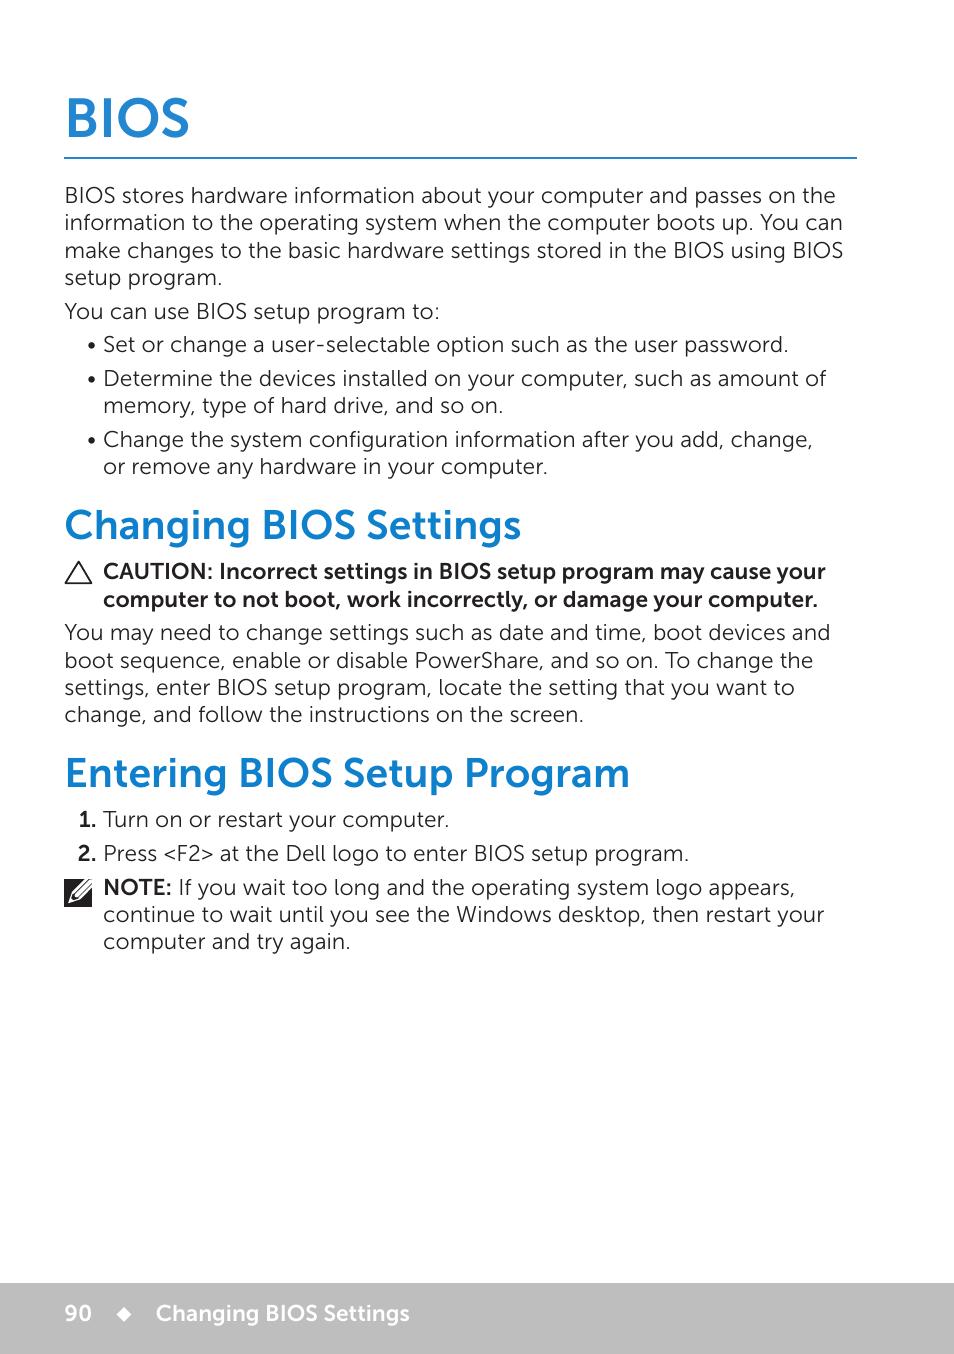 Bios, Changing bios settings, Entering bios setup program